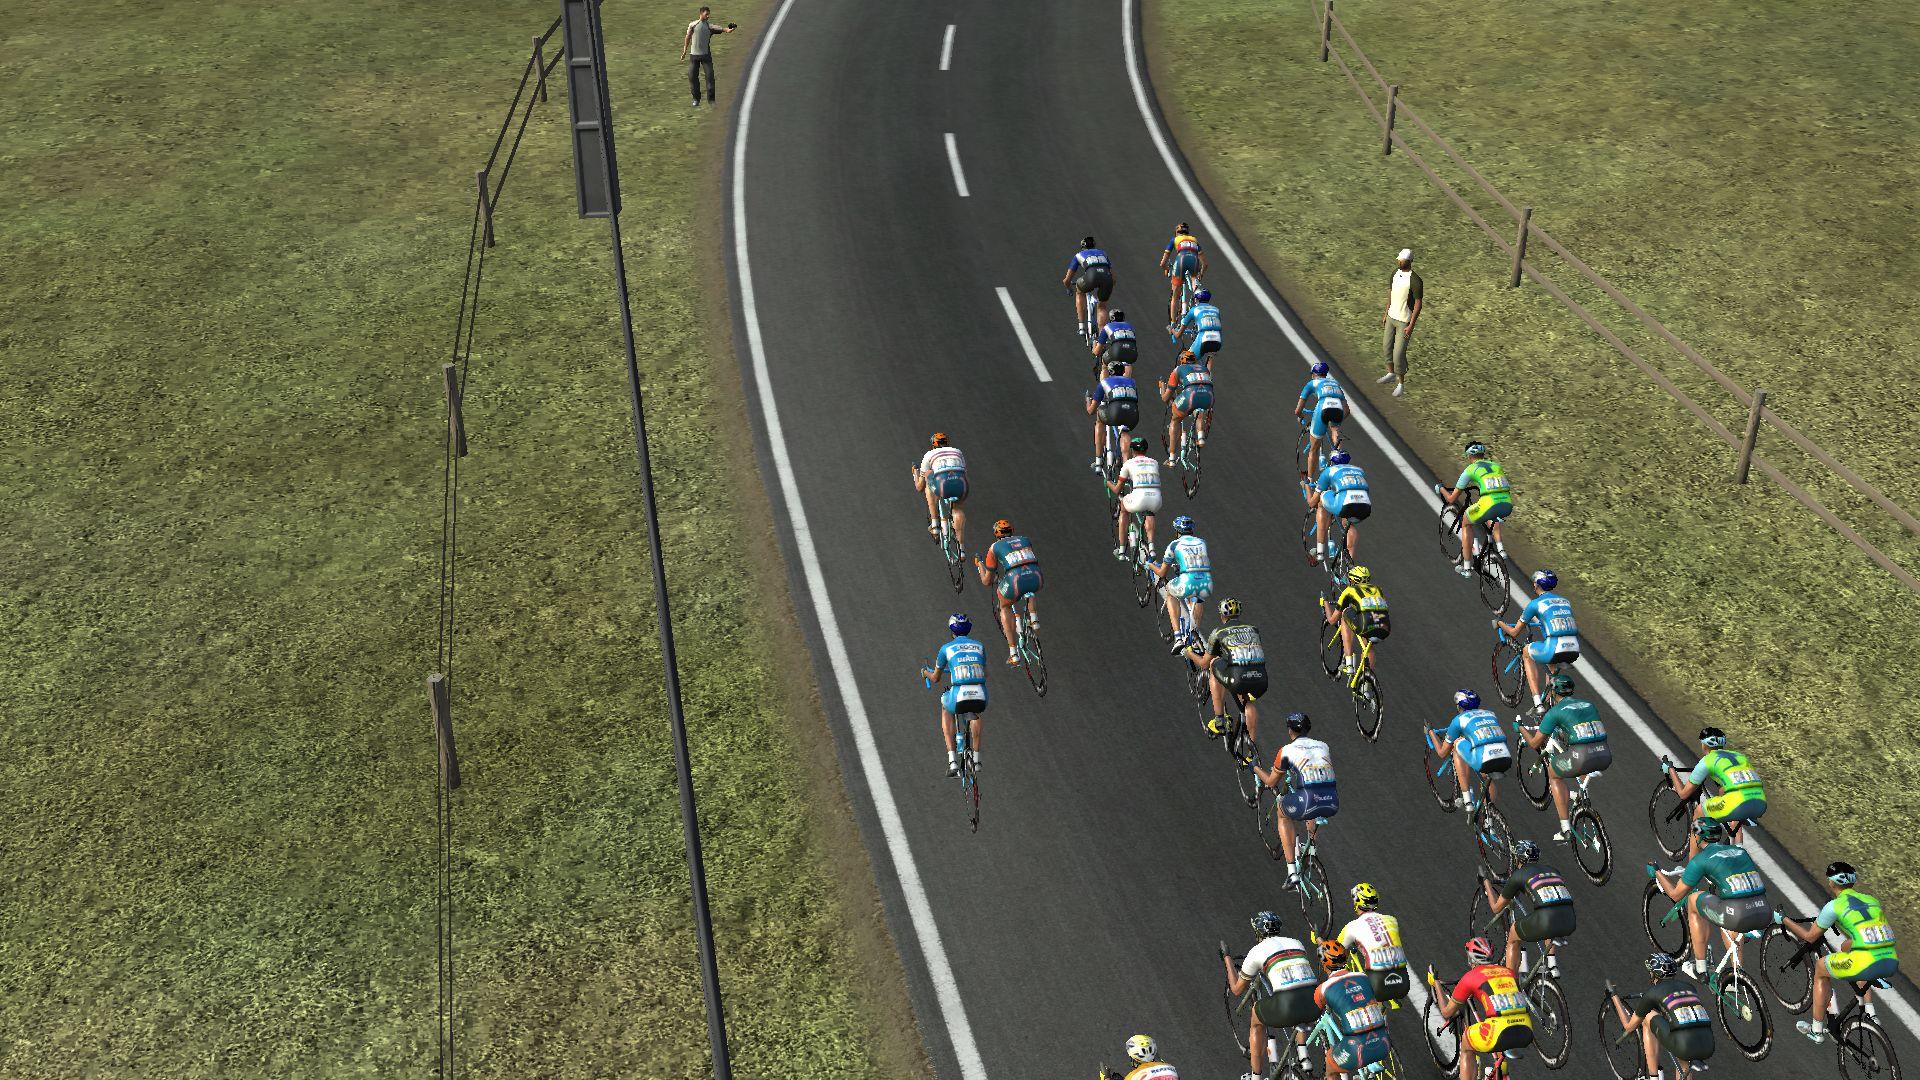 pcmdaily.com/images/mg/2019/Races/GTM/Giro/mg19_giro_10_PCM0110.jpg